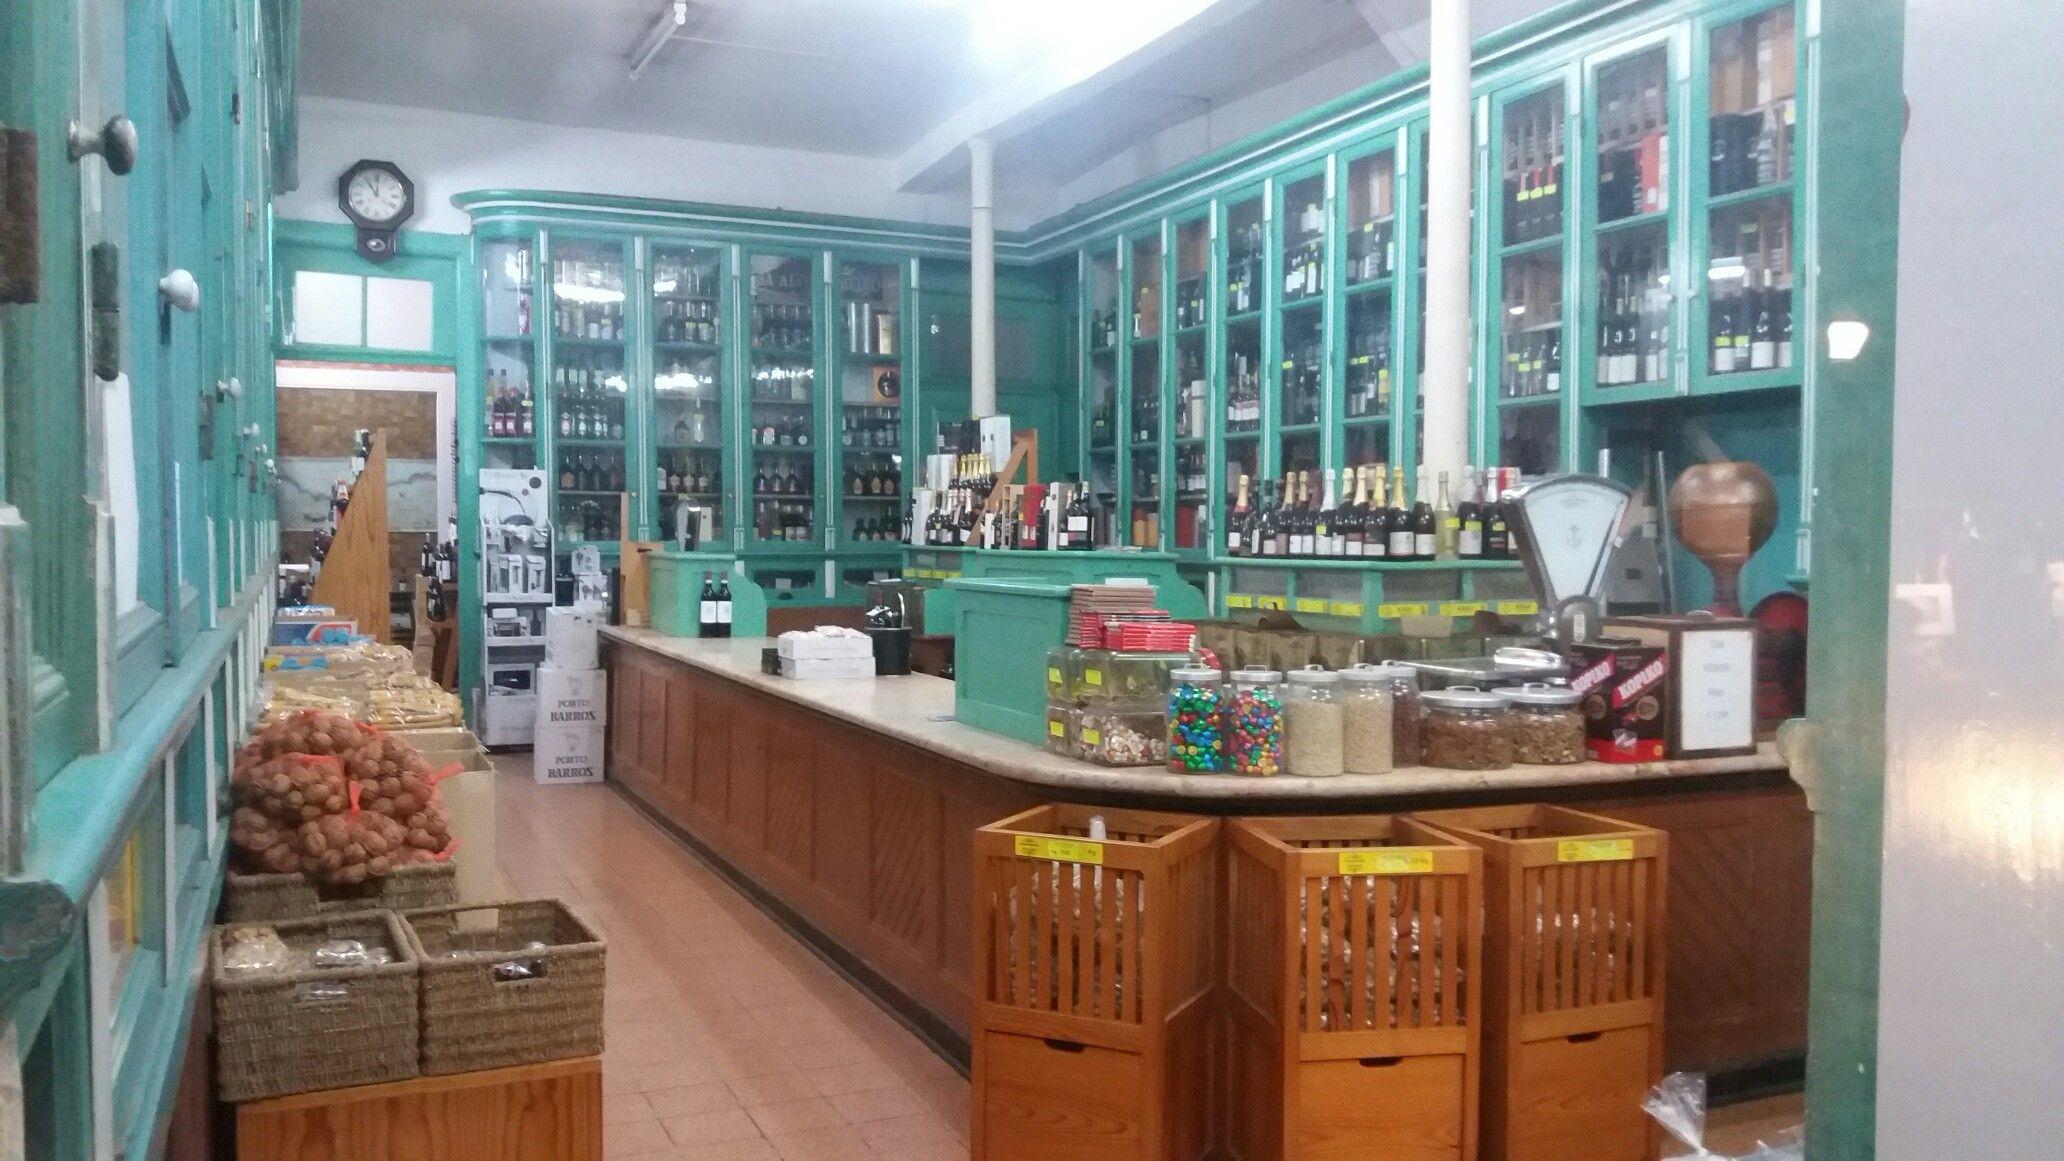 Casa Alves Ribeira, fundada en 1900, Espinho